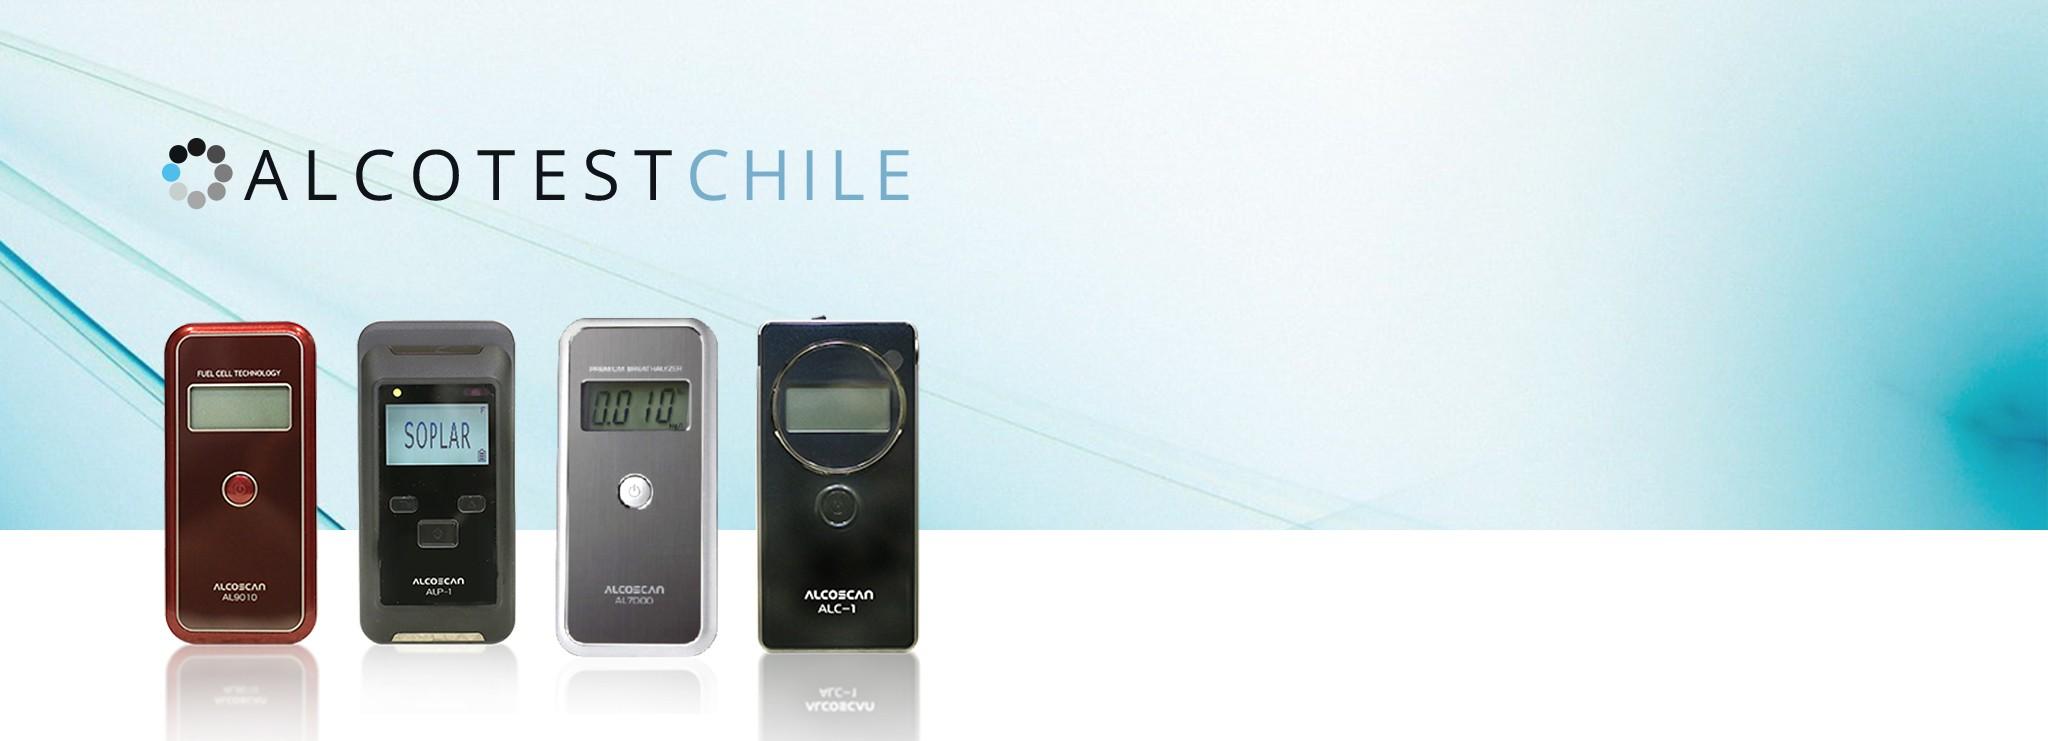 Alcotest Chile